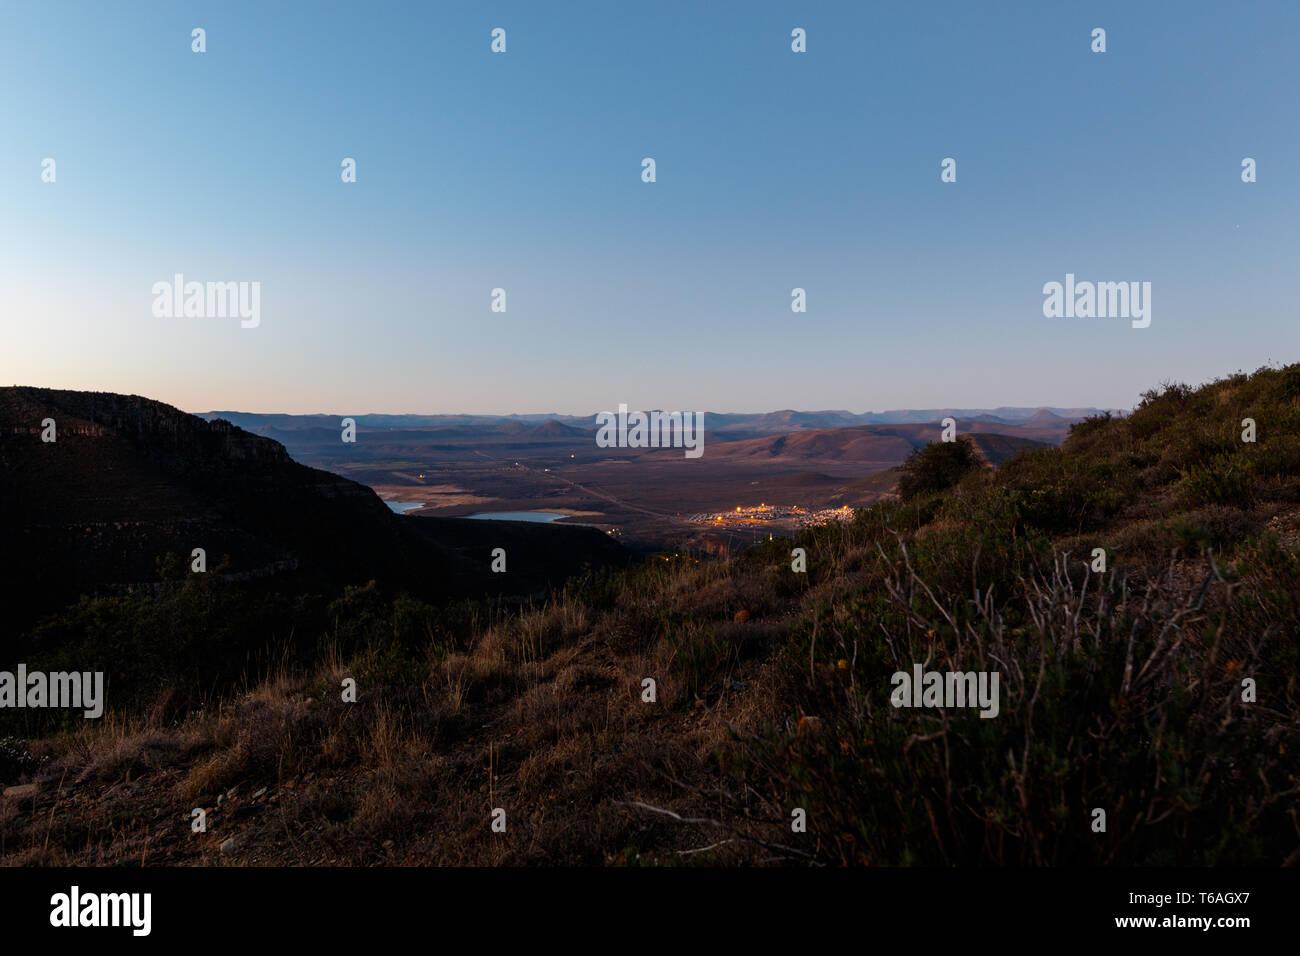 Overlooking the town - Graaff-Reinet, Valley Of Desolation - Stock Image